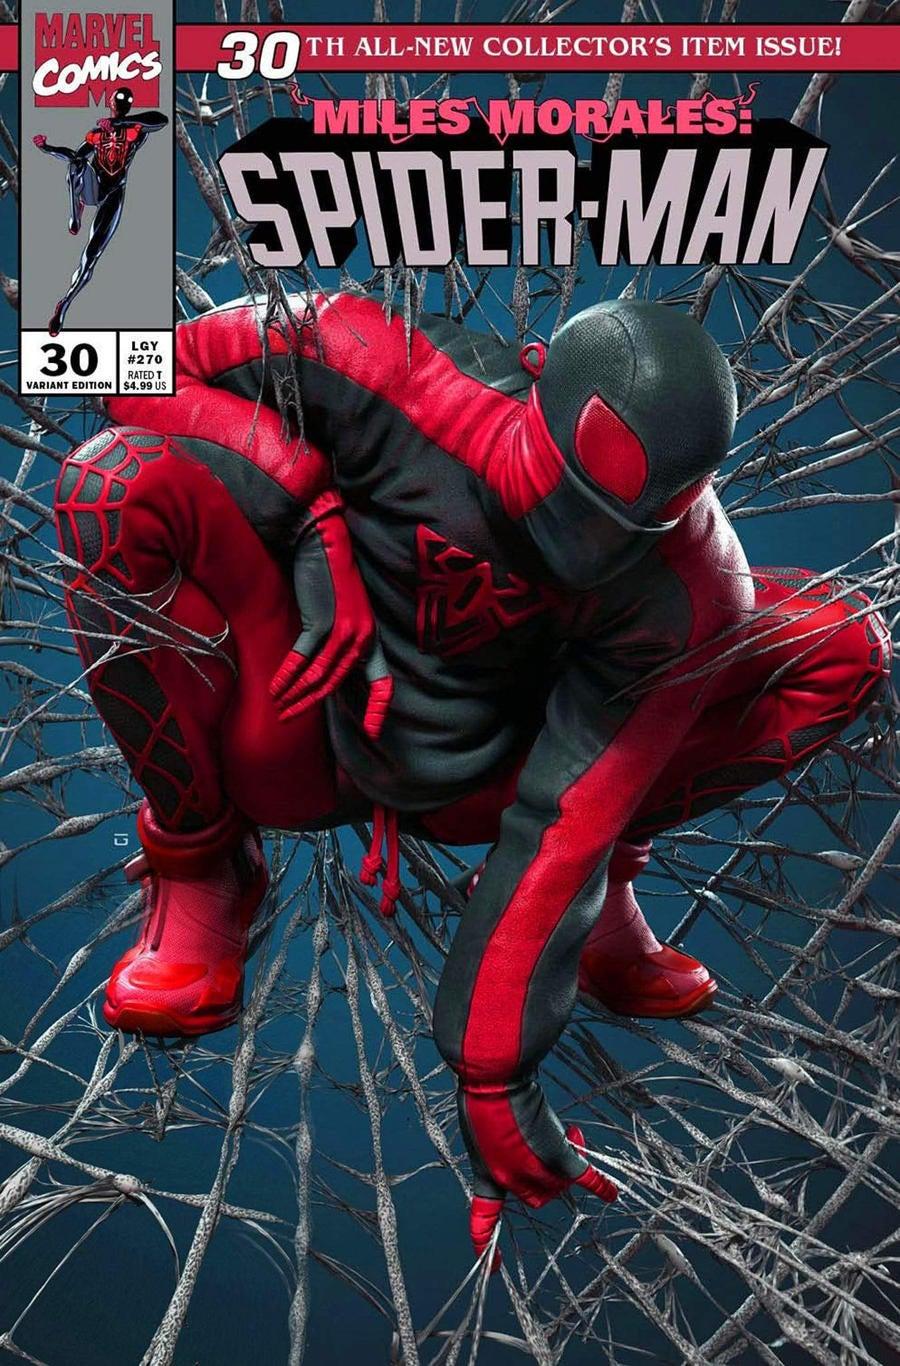 miles-morales-spider-man-vol-1-30-7-ate-9-comics-exclusive-variant.jpg